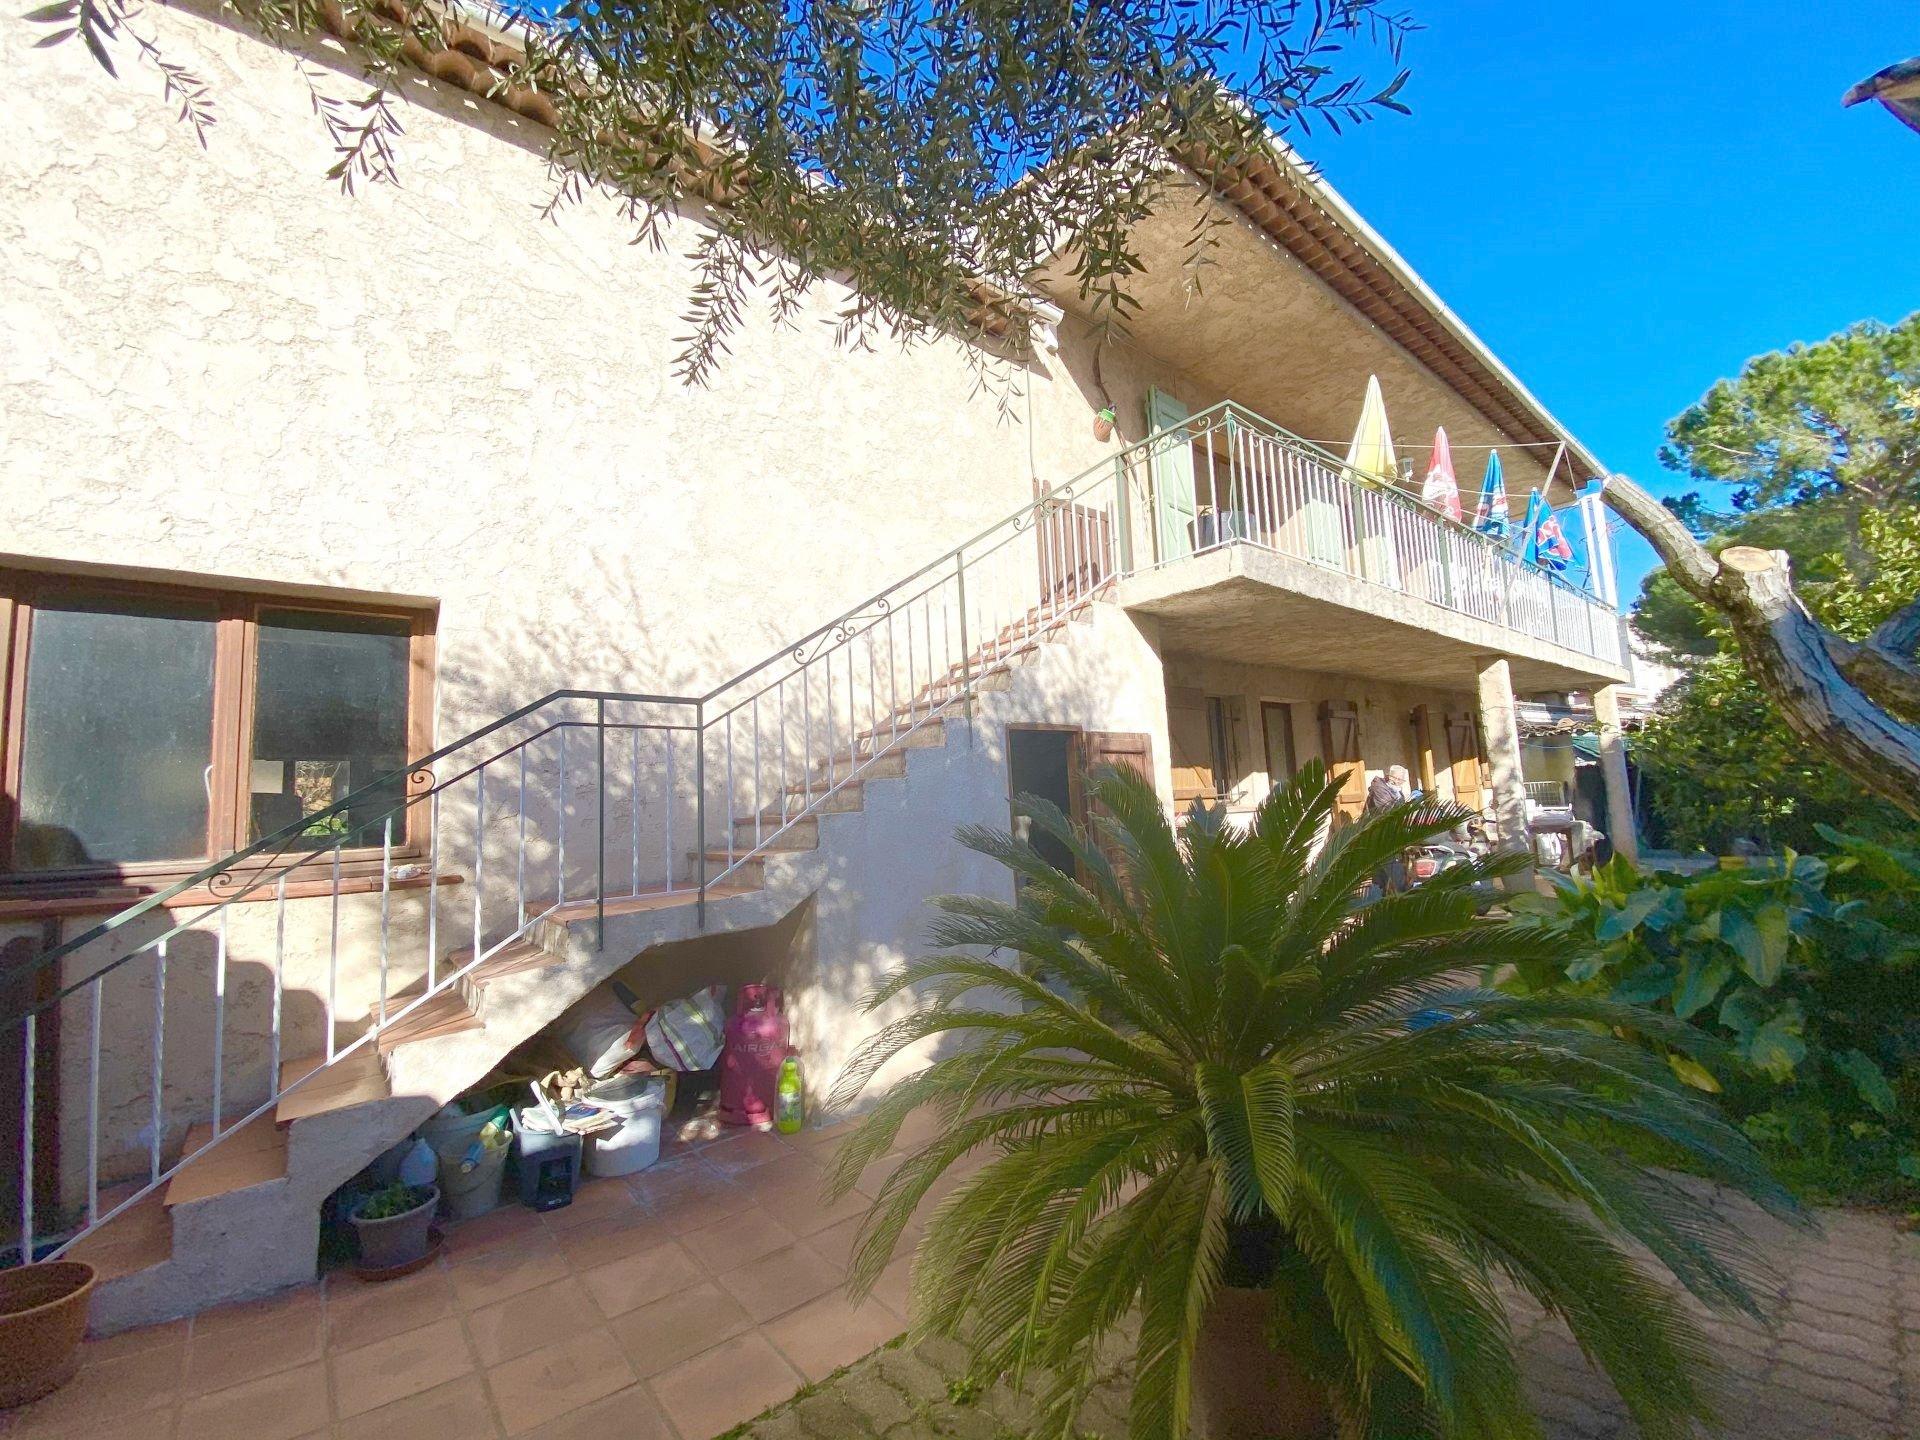 LE CANNET 15mn beaches, family house